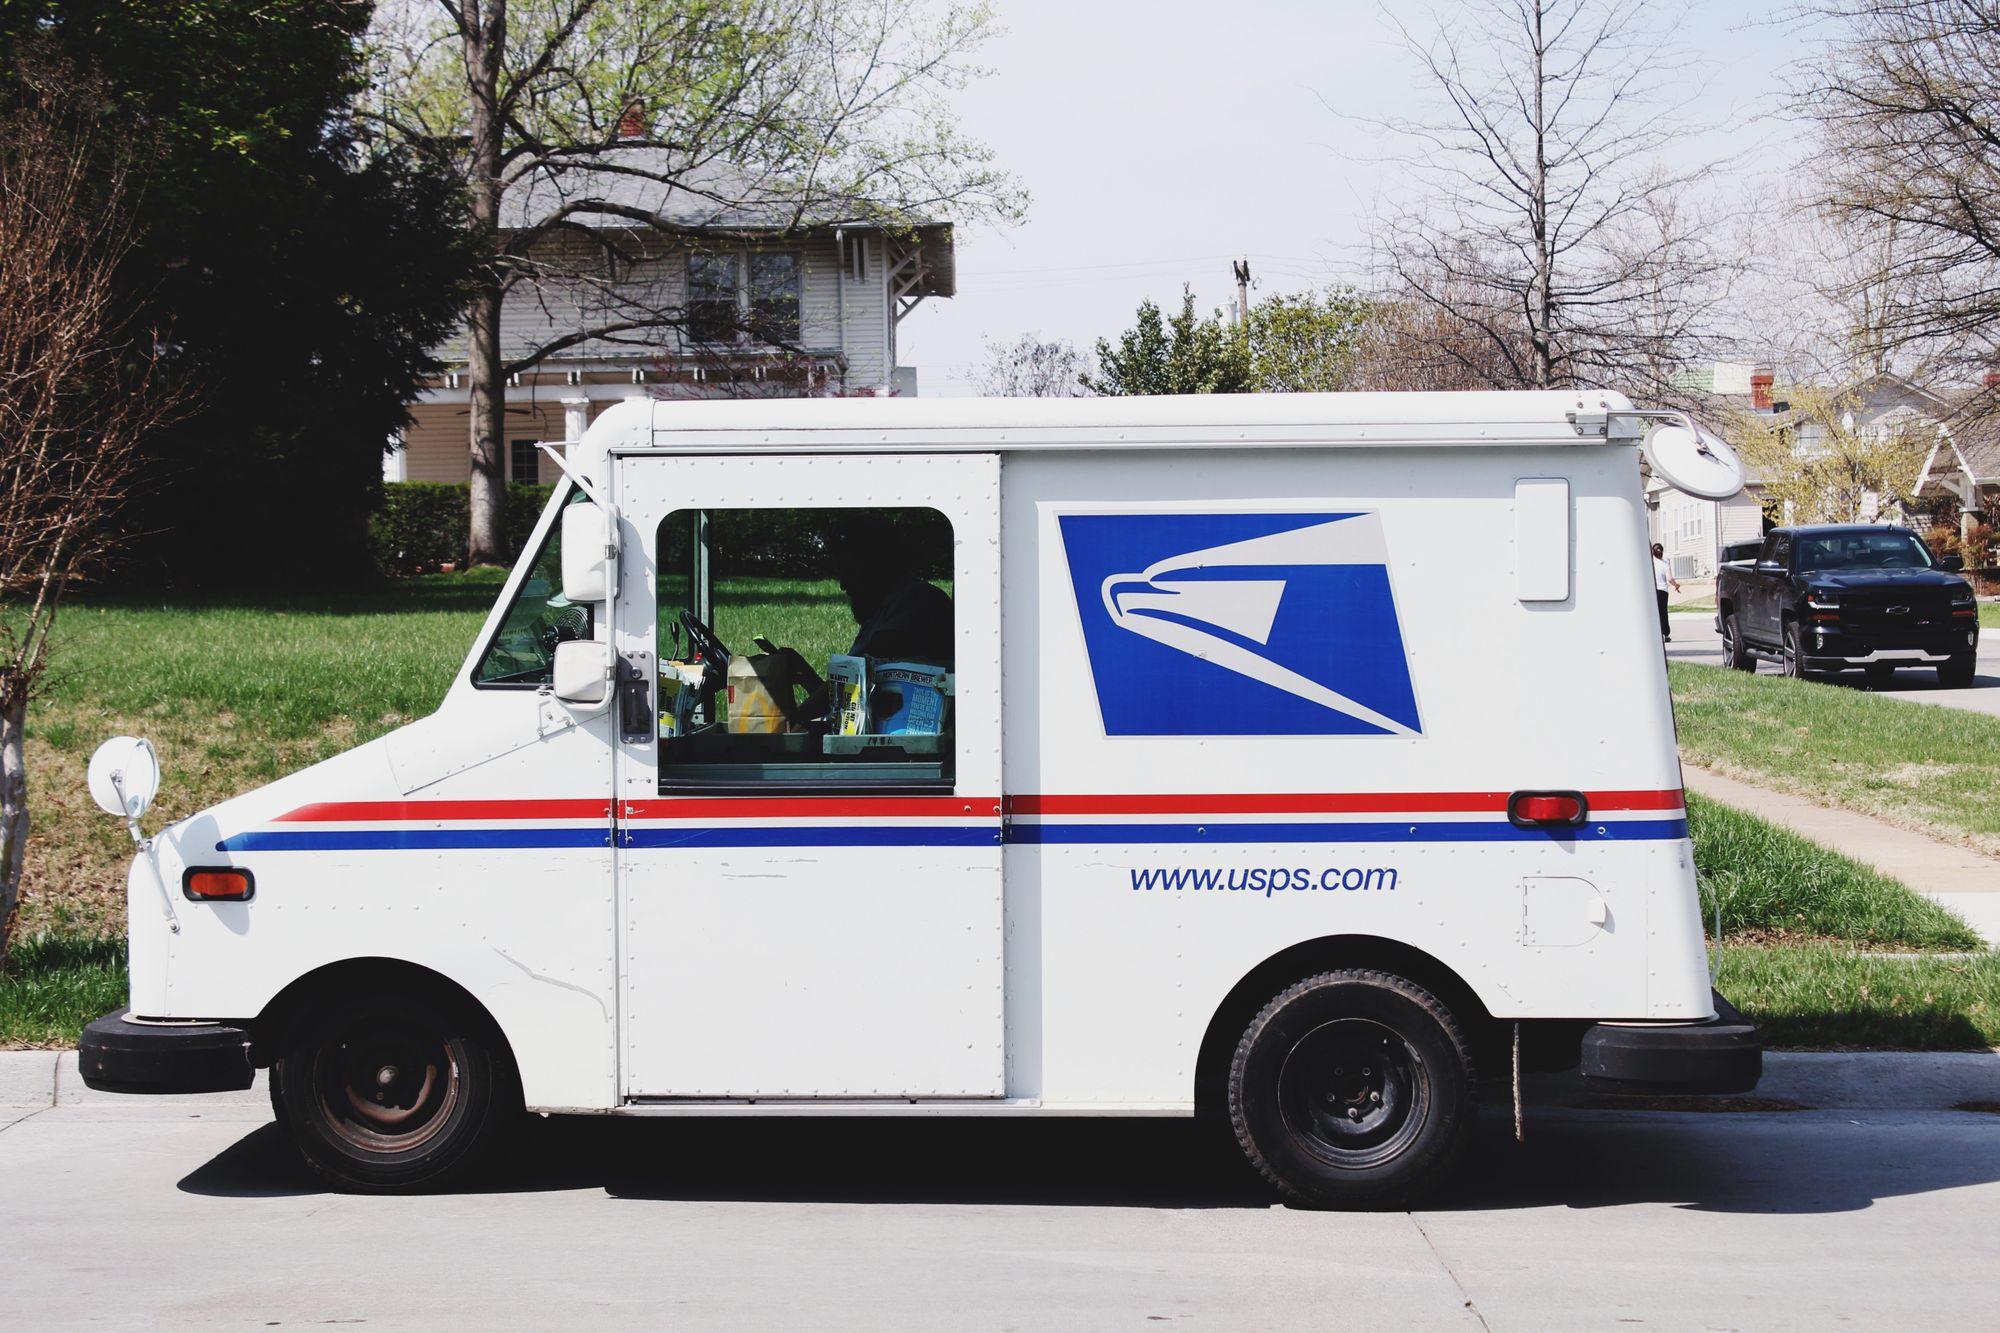 USPS Shipment Stuck In Transit